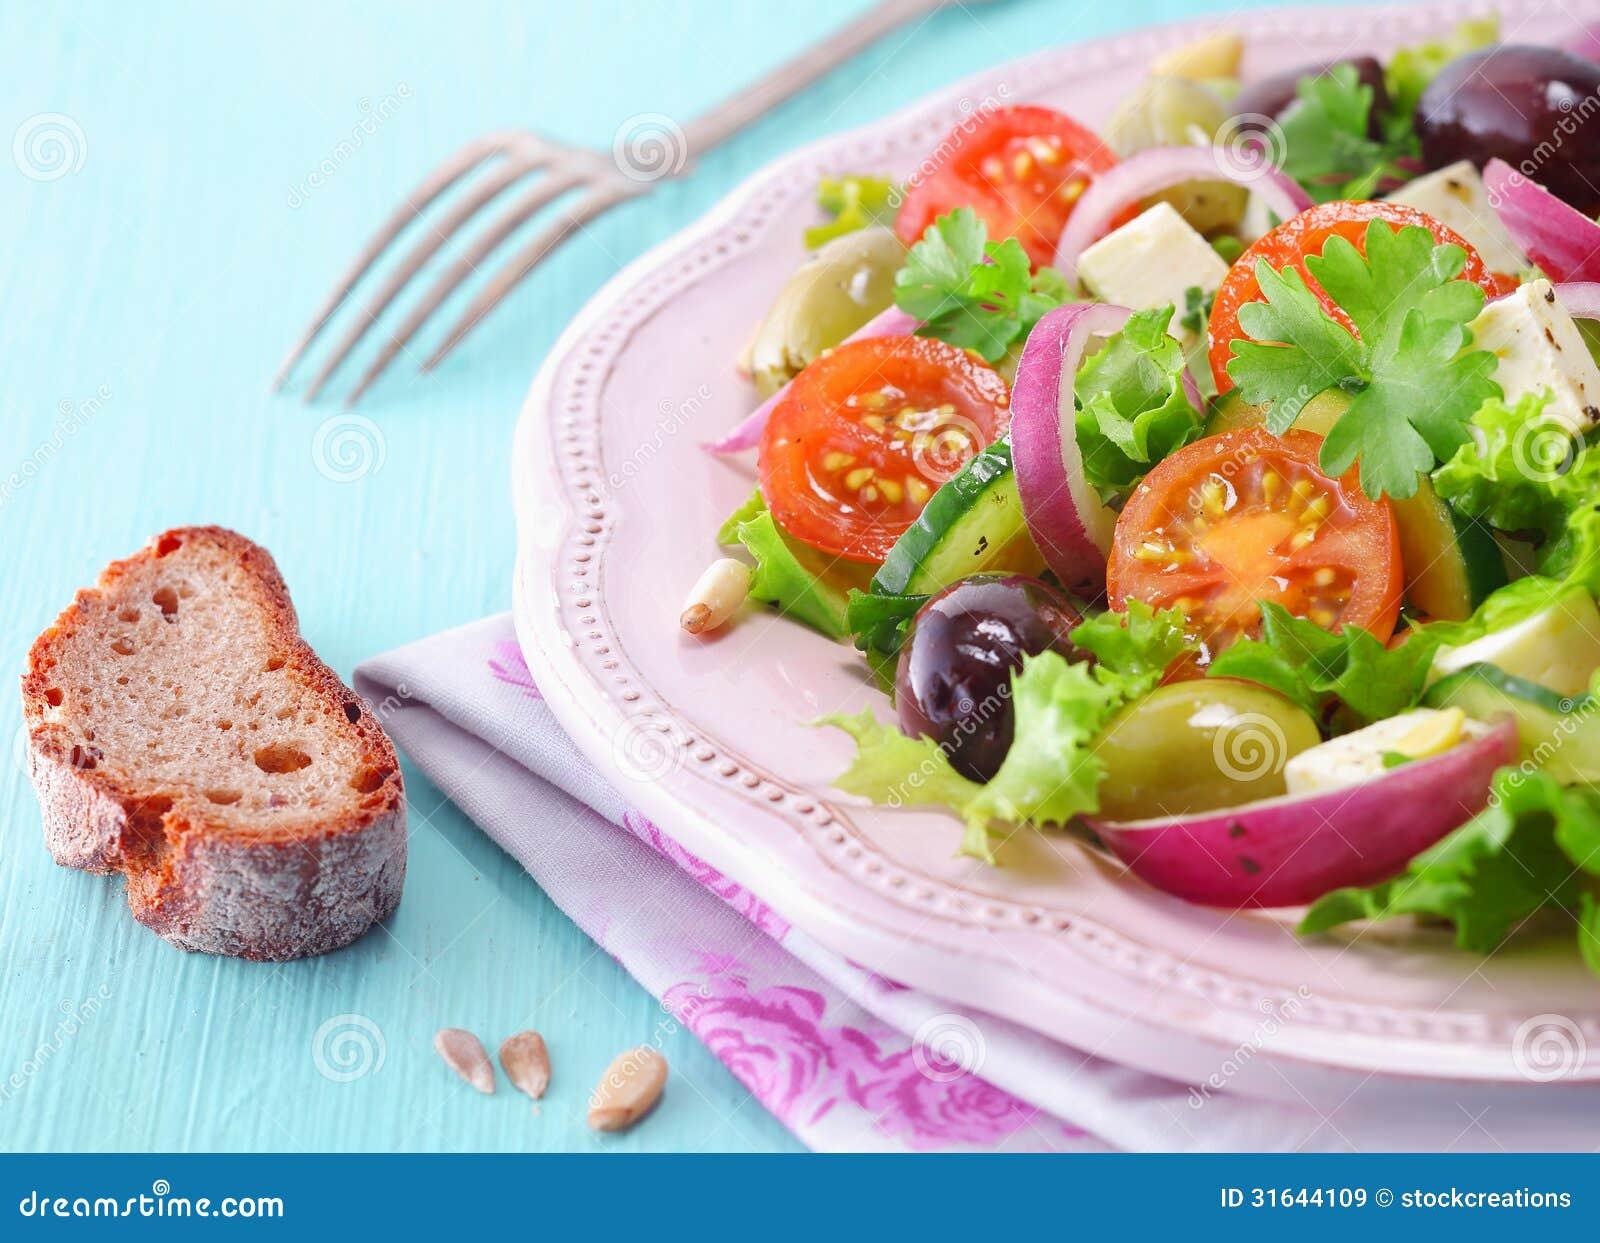 Rye bread and feta salad stock image. Image of greens ...